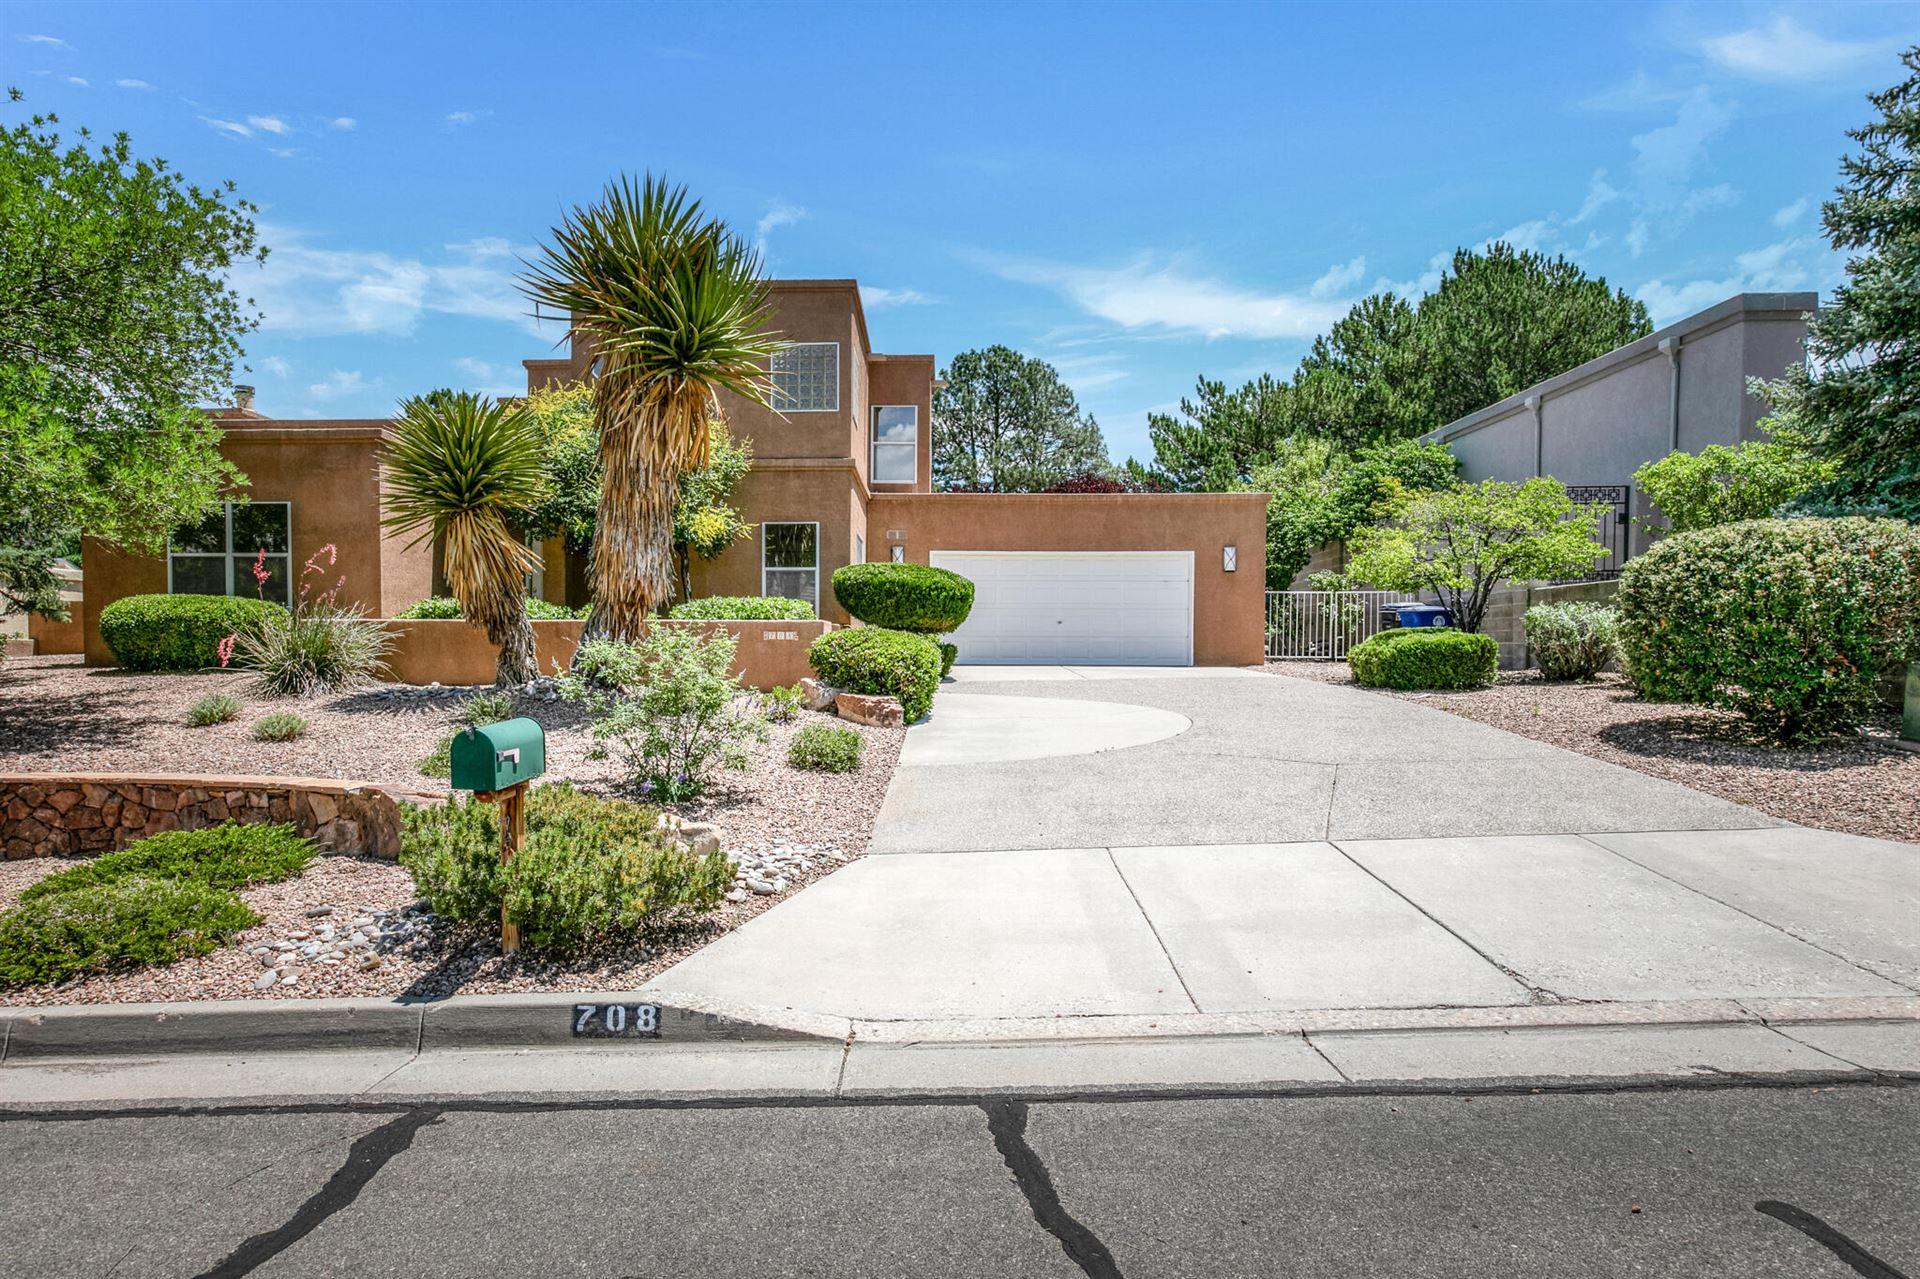 708 KIVA Drive SE, Albuquerque, NM 87123 - MLS#: 984351